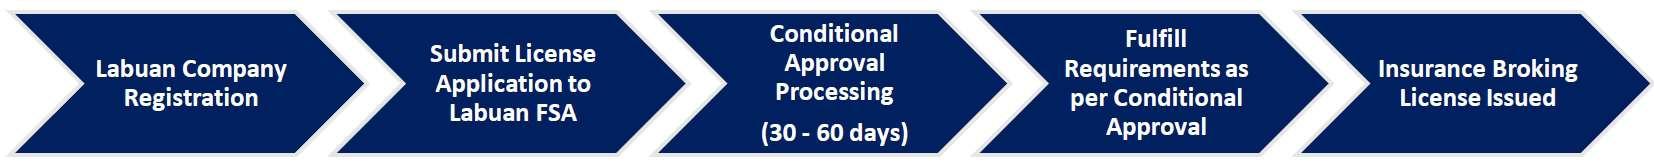 Process flow for Obtaining A Labuan Insurance Broking Licence   QX Trust - Offshore Labuan